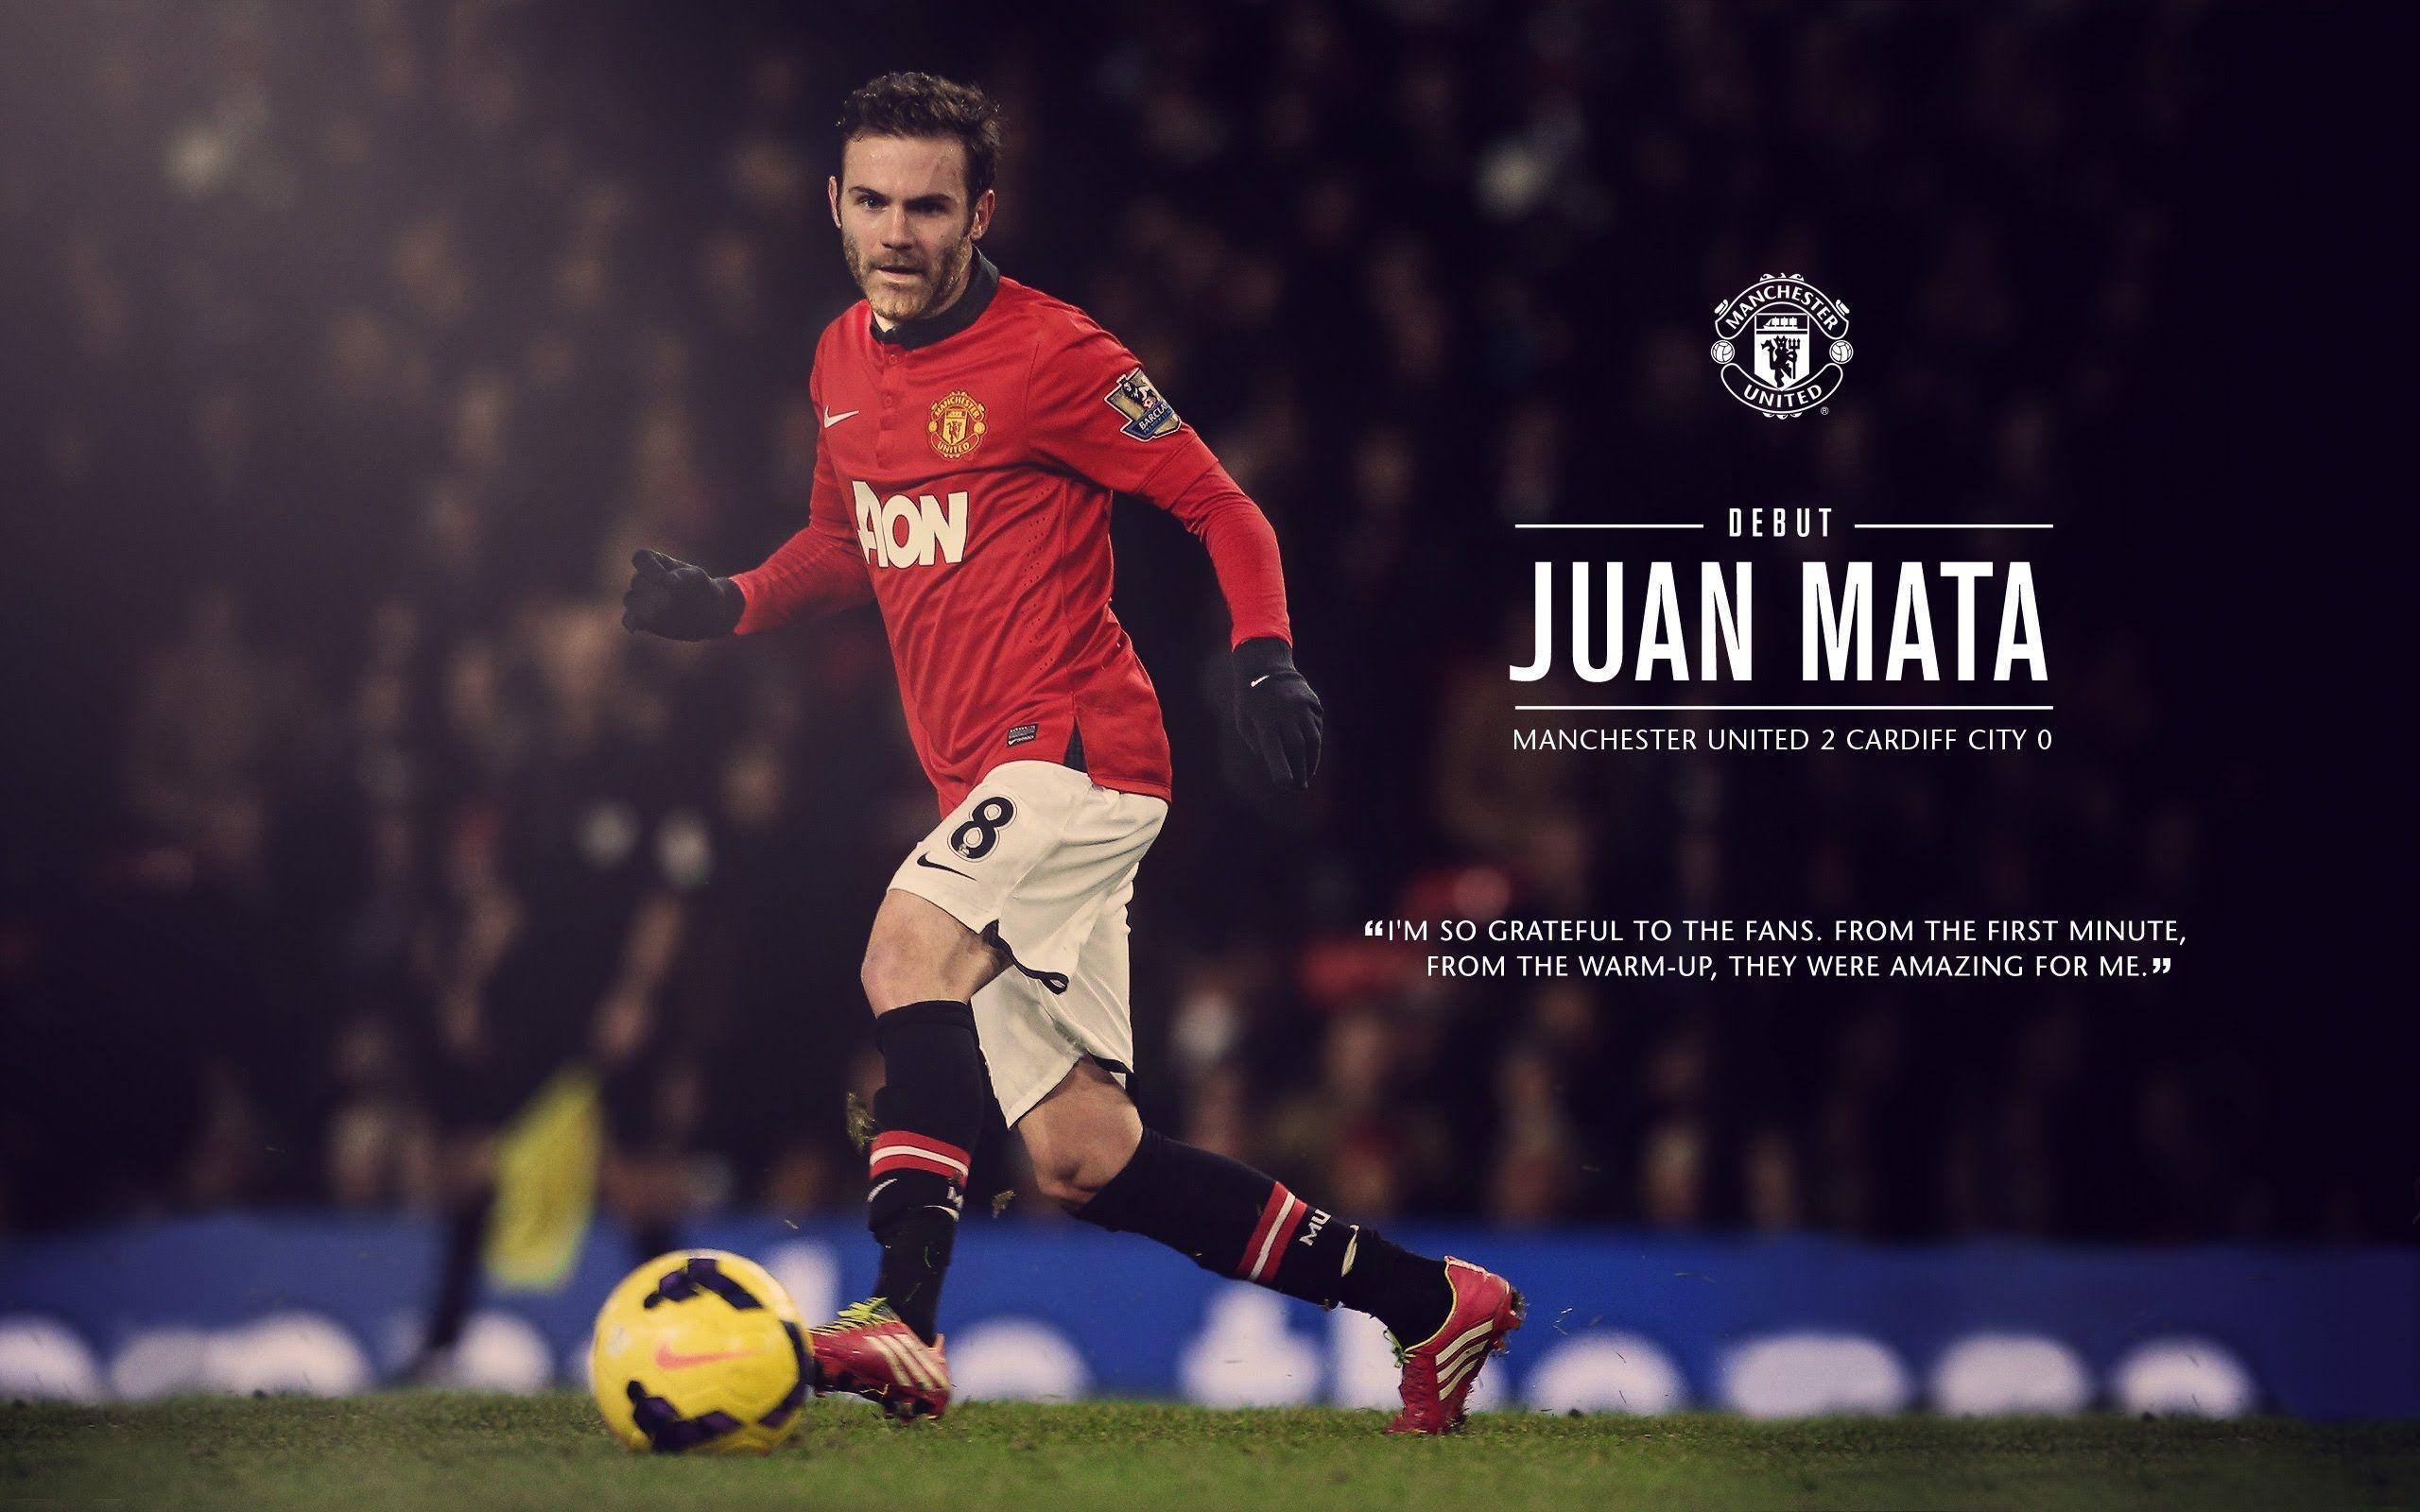 Juan Mata HD Images - New HD Images